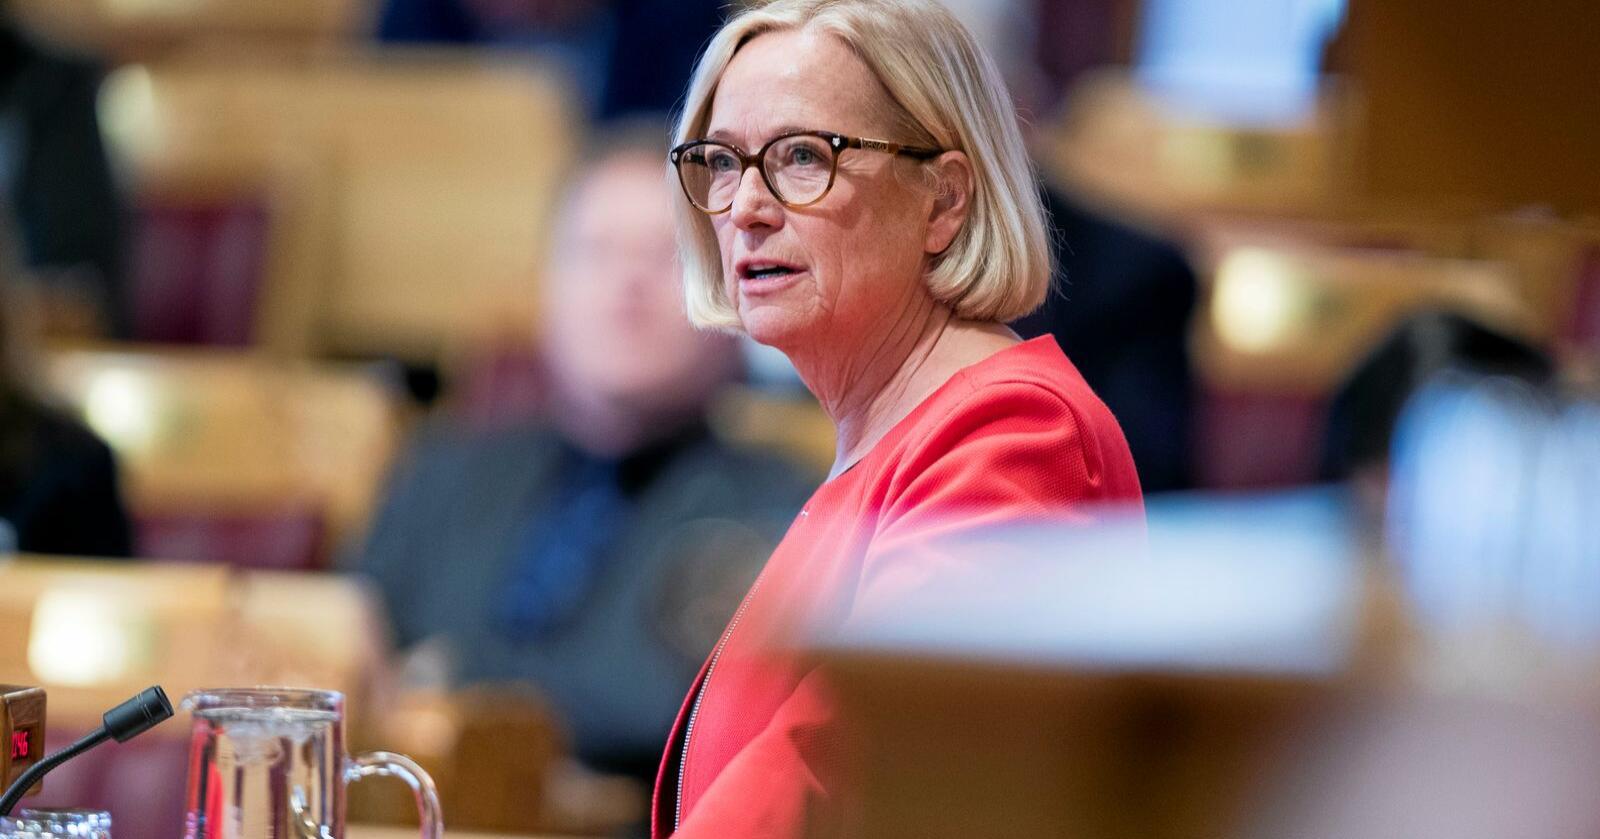 Får kritikk: Parlamentarisk leder for Sp, Marit Arnstad. Foto: Terje Pedersen / NTB scanpix